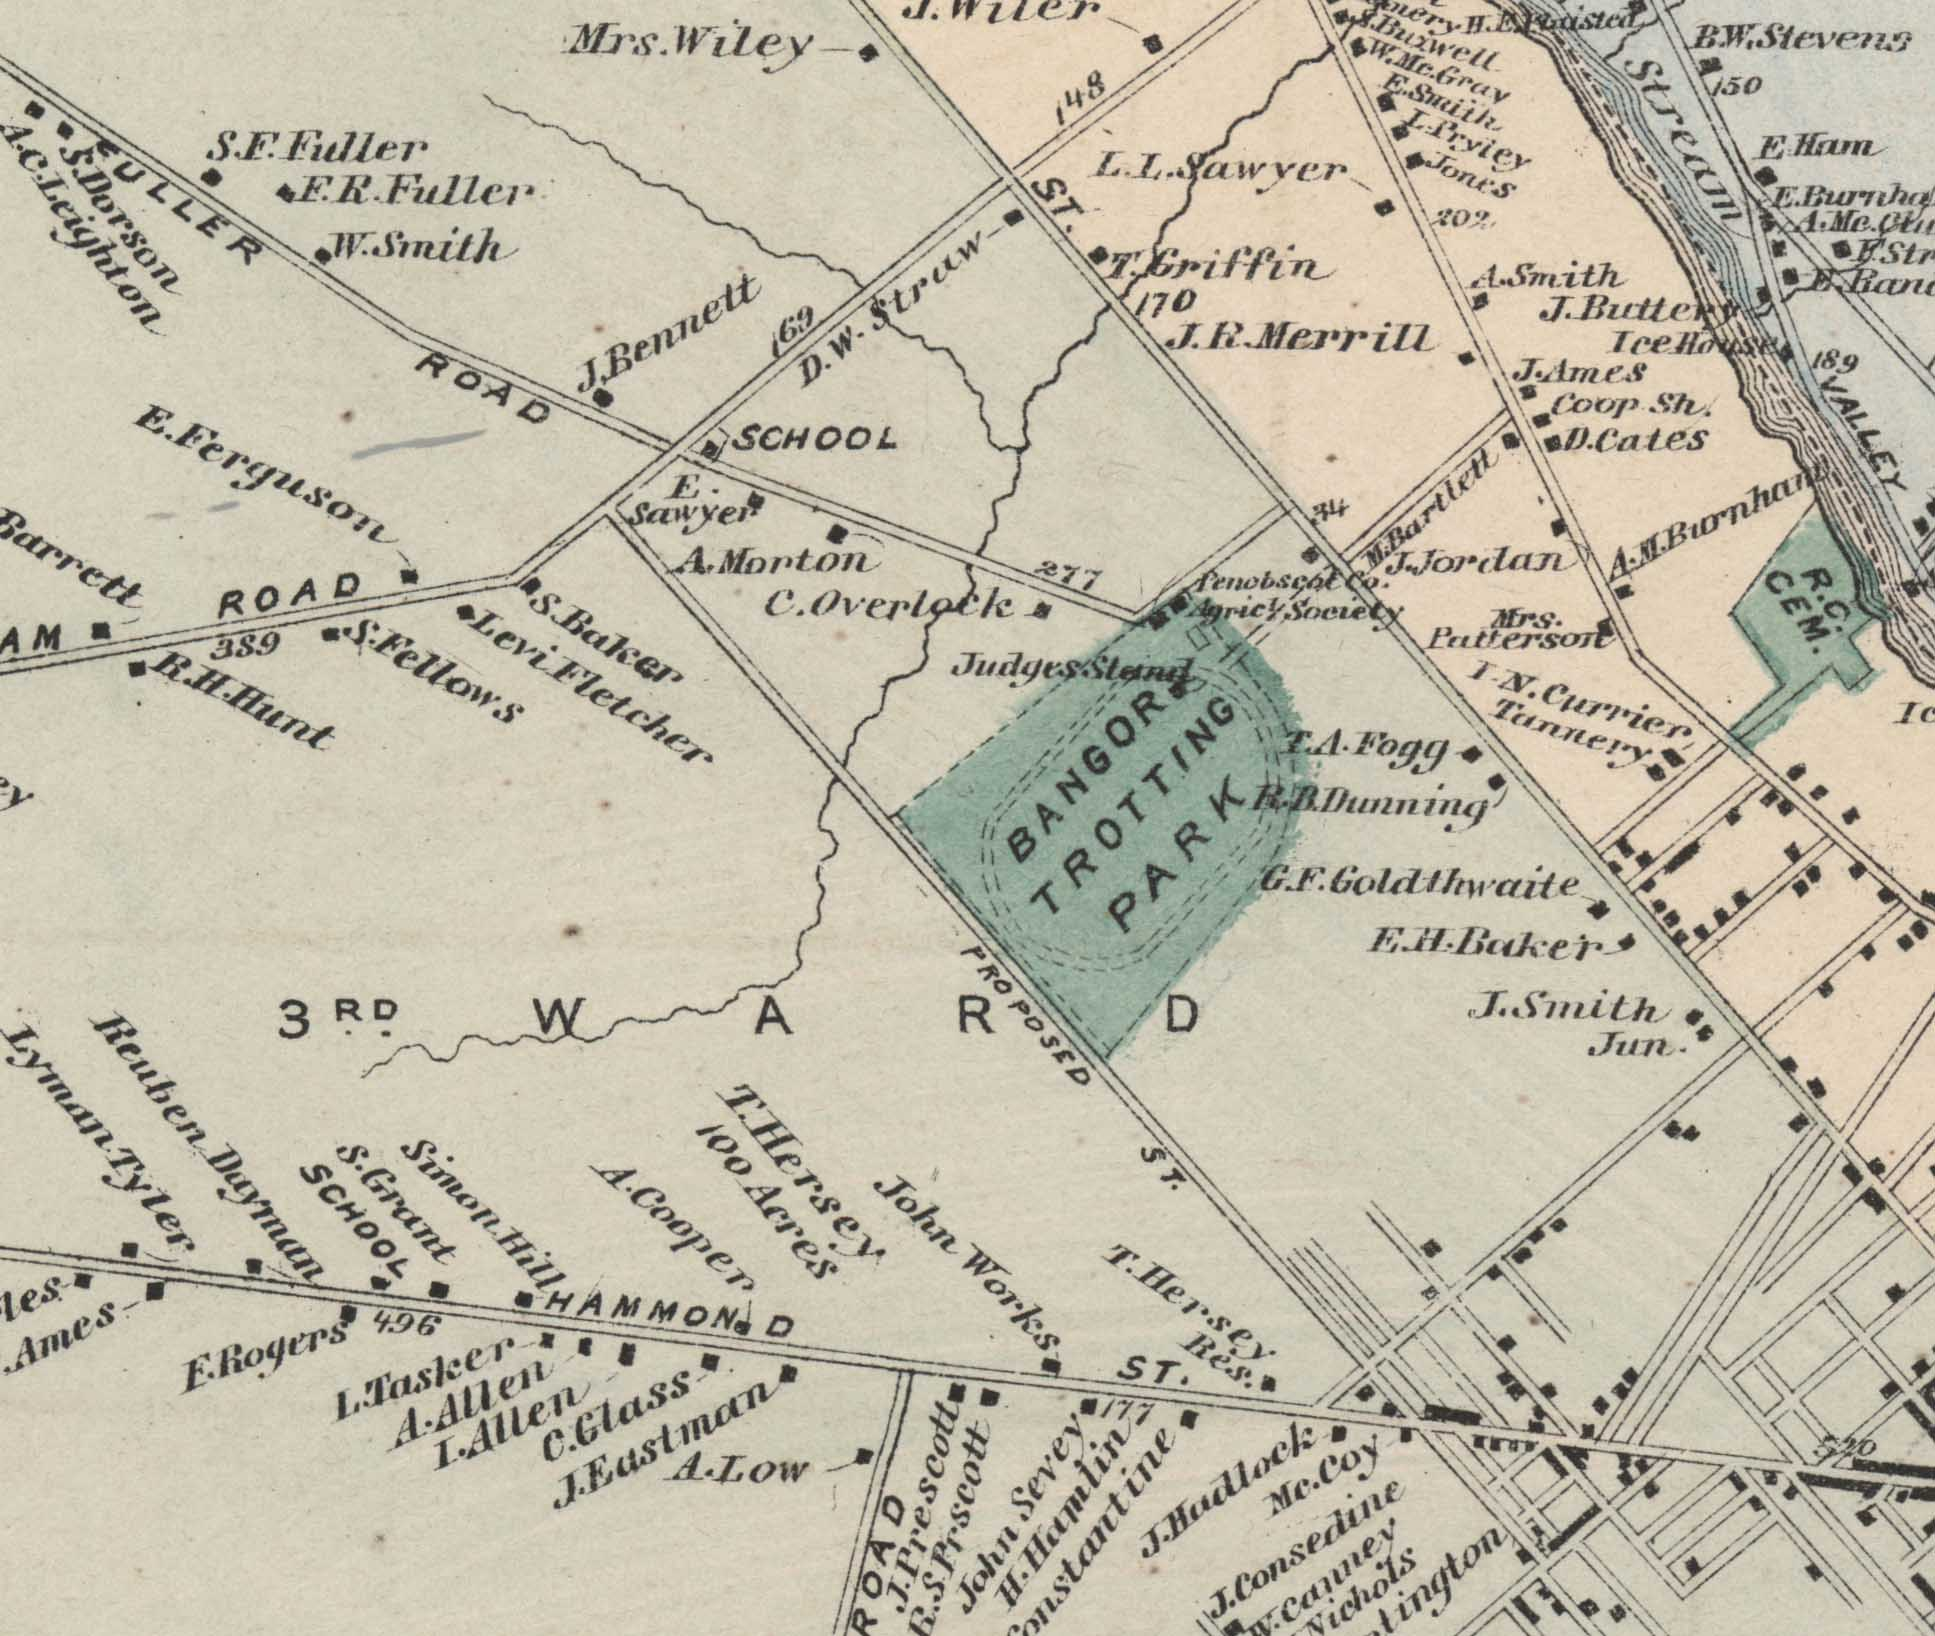 Bangor's Lost Trotting Park Built in 1851